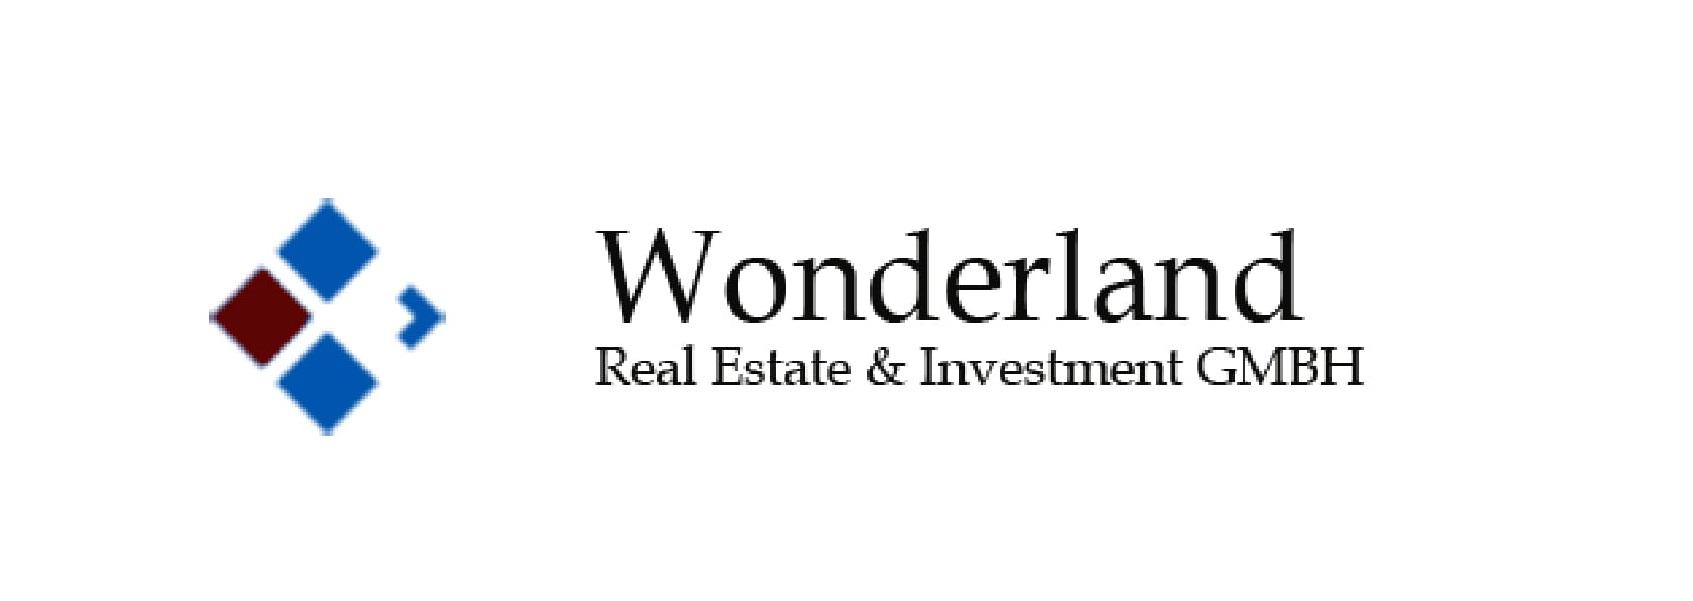 Wonderland Real Estate & Investment GmbH Logo